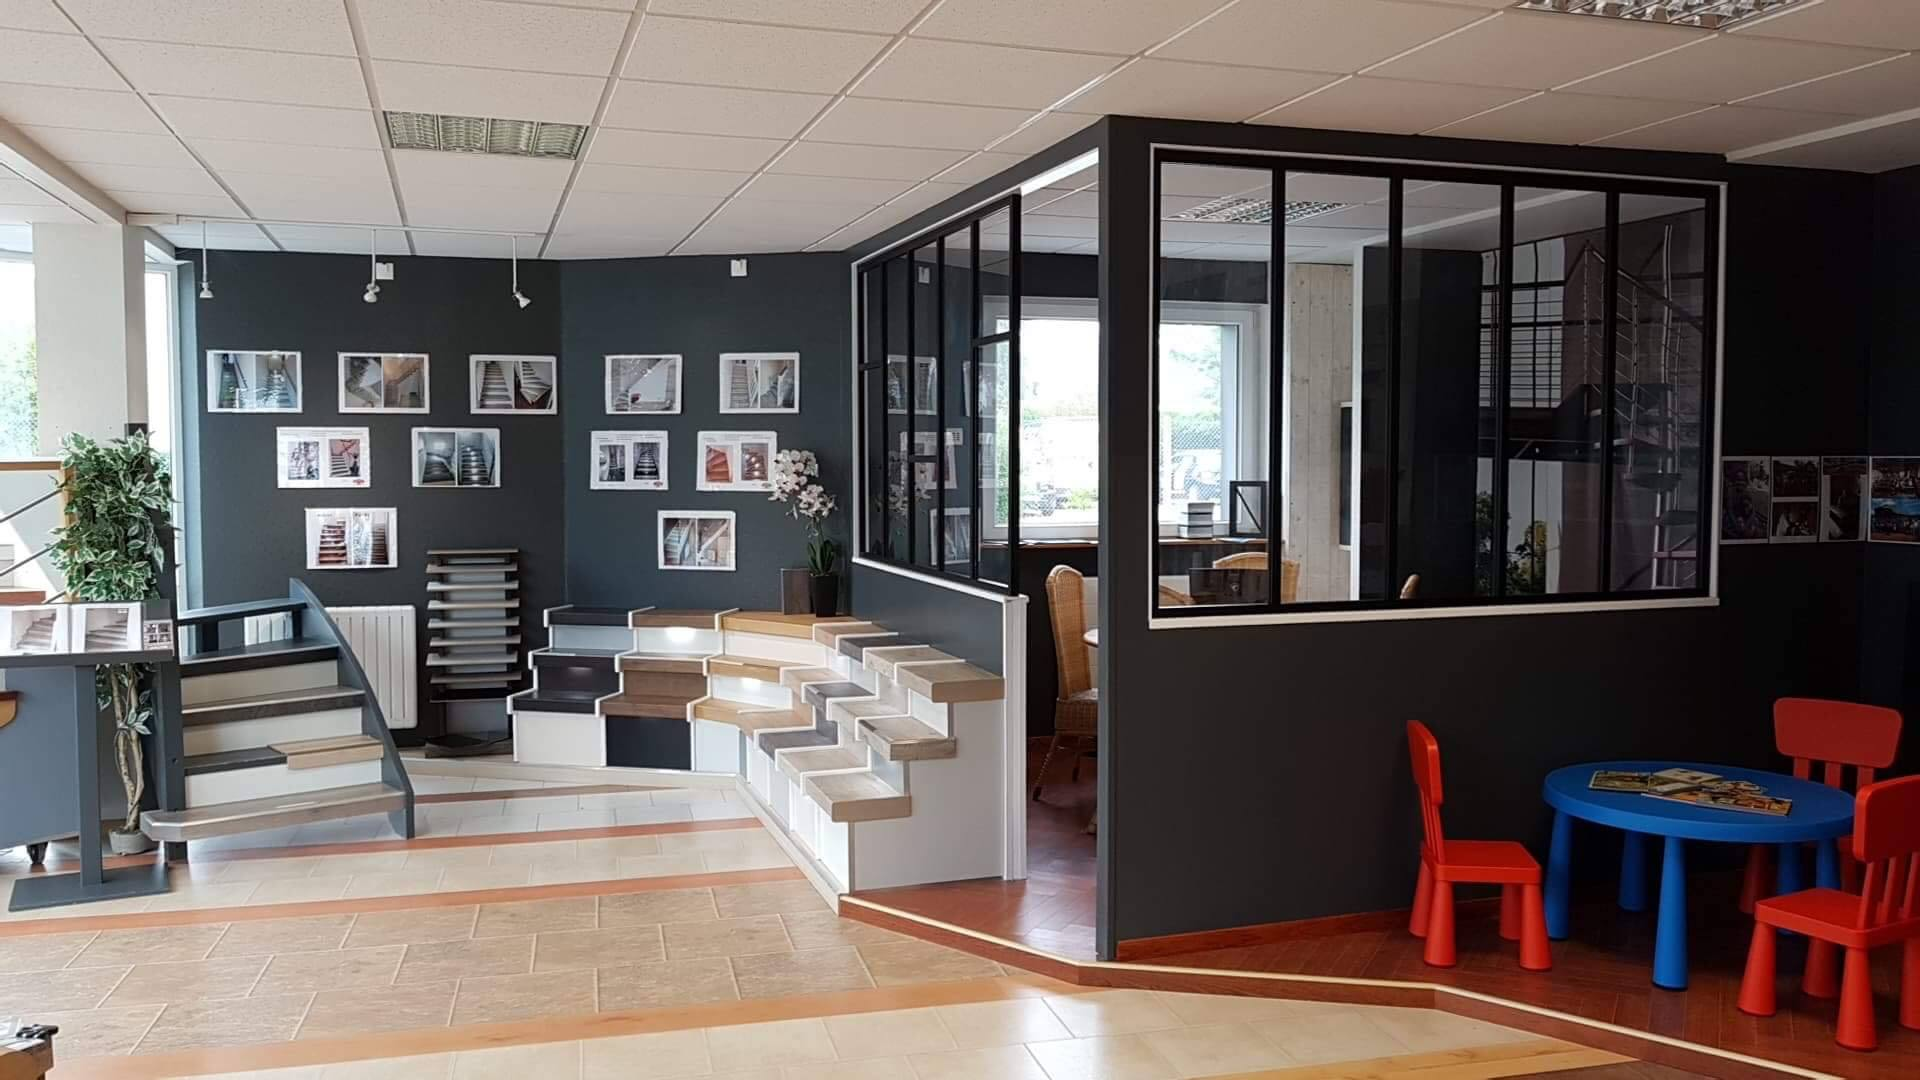 verri re sur mesure etude fourniture pose de votre verri re m tal. Black Bedroom Furniture Sets. Home Design Ideas